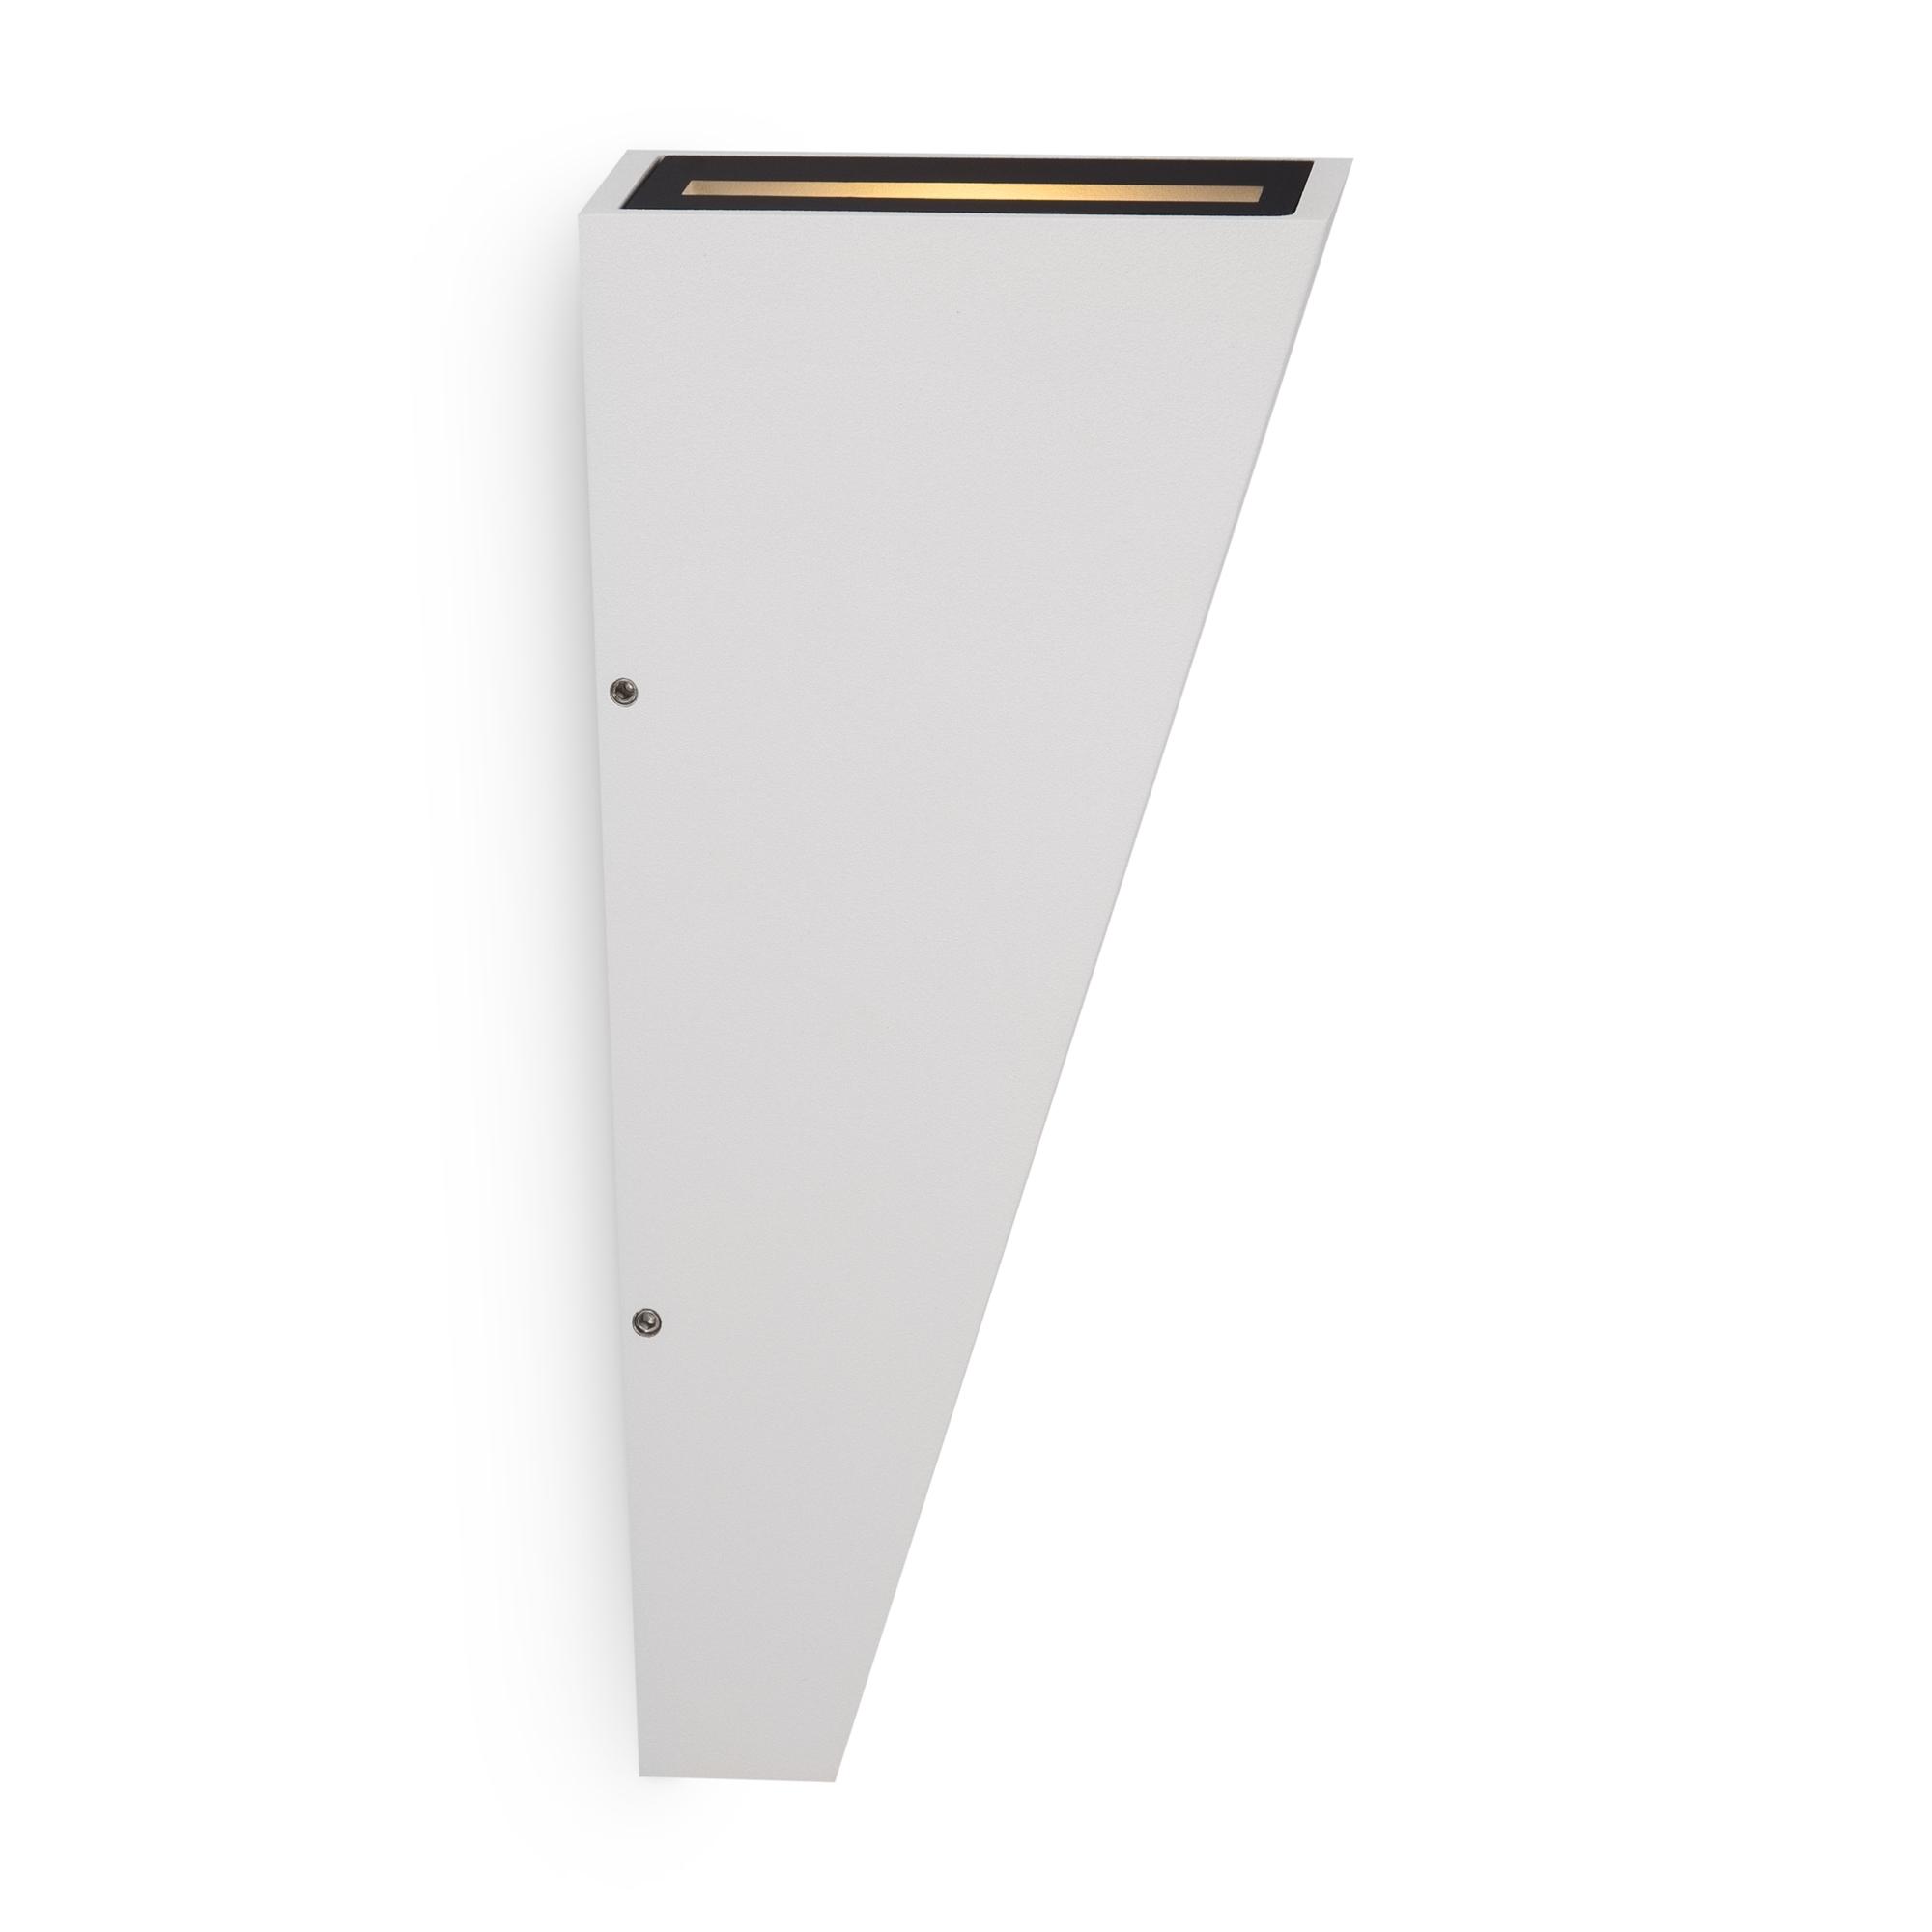 Настенный светодиодный светильник Maytoni Times Square O580WL-L6W, IP54, LED 6W 3000K 380lm CRI80, белый, металл - фото 1